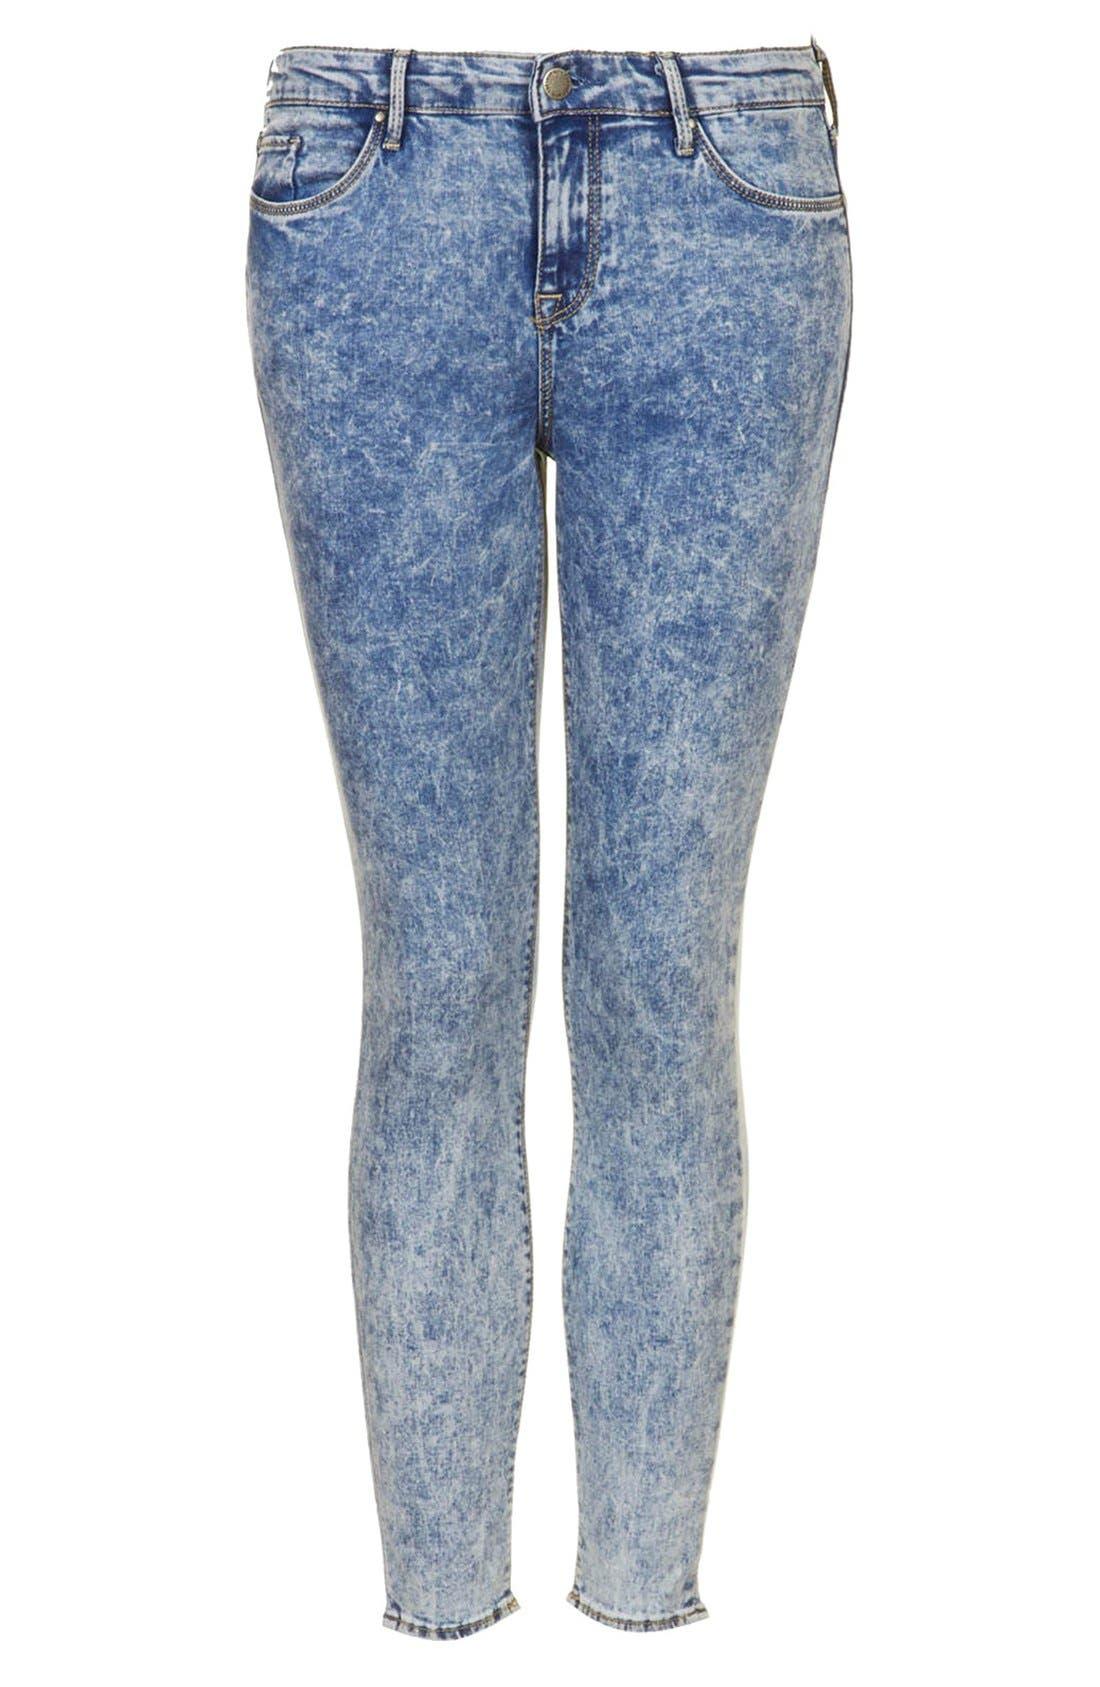 Alternate Image 3  - Topshop Moto 'Leigh' Acid Wash Skinny Jeans (Light Denim) (Petite)